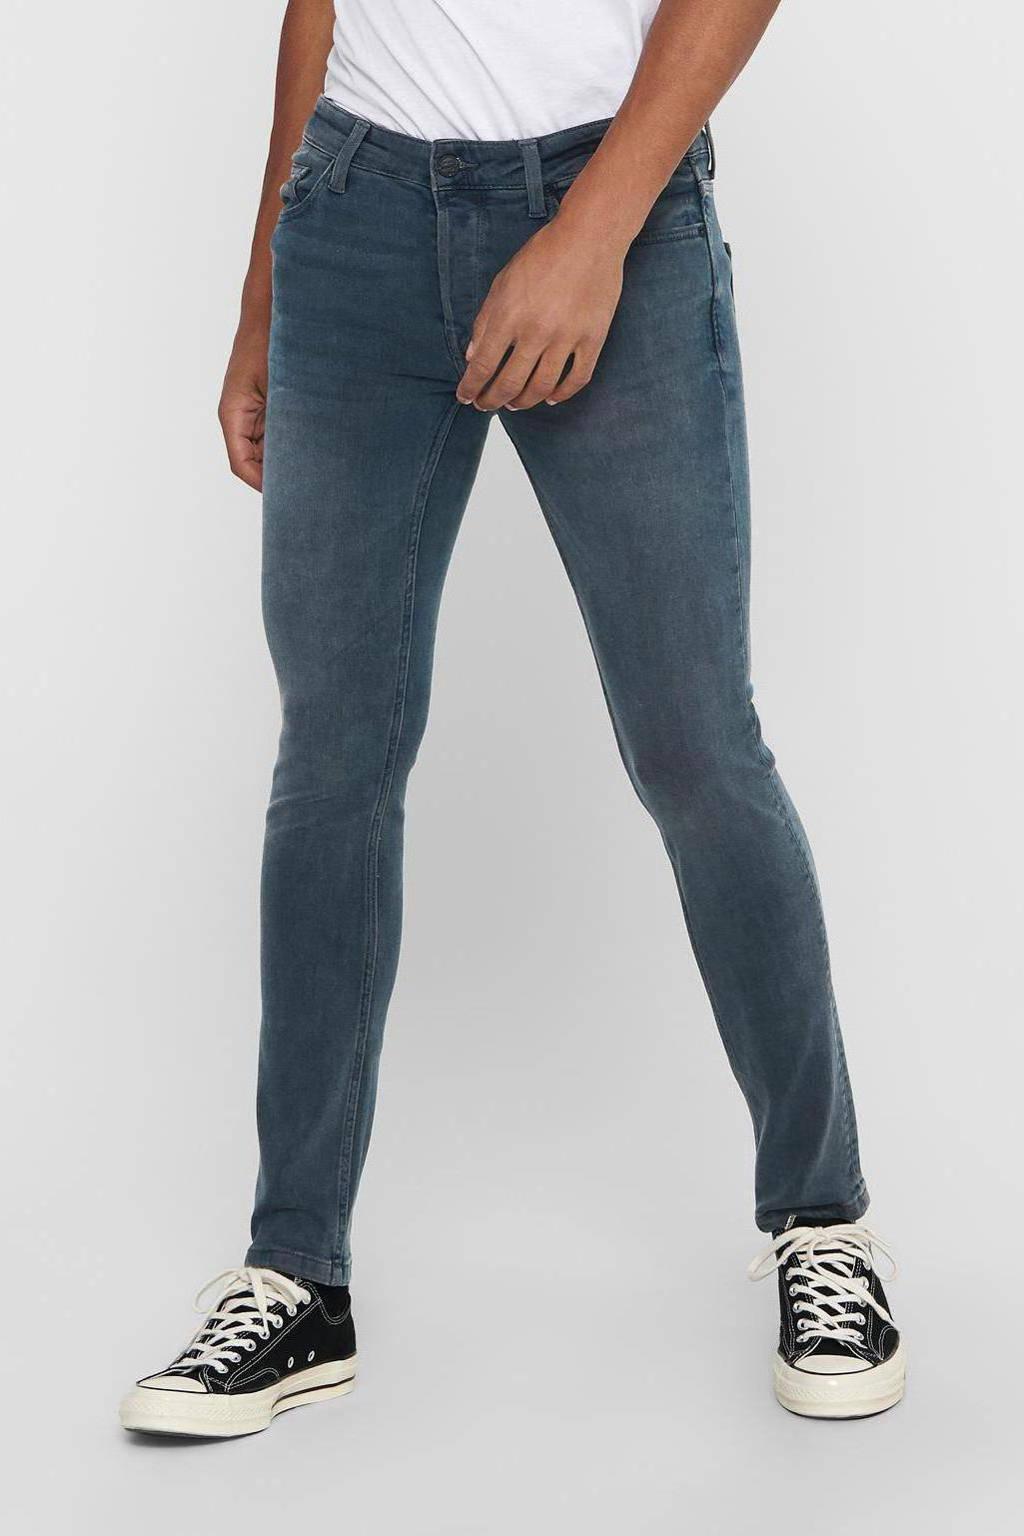 ONLY & SONS slim fit jeans Loom grijsblauw, Grijsblauw